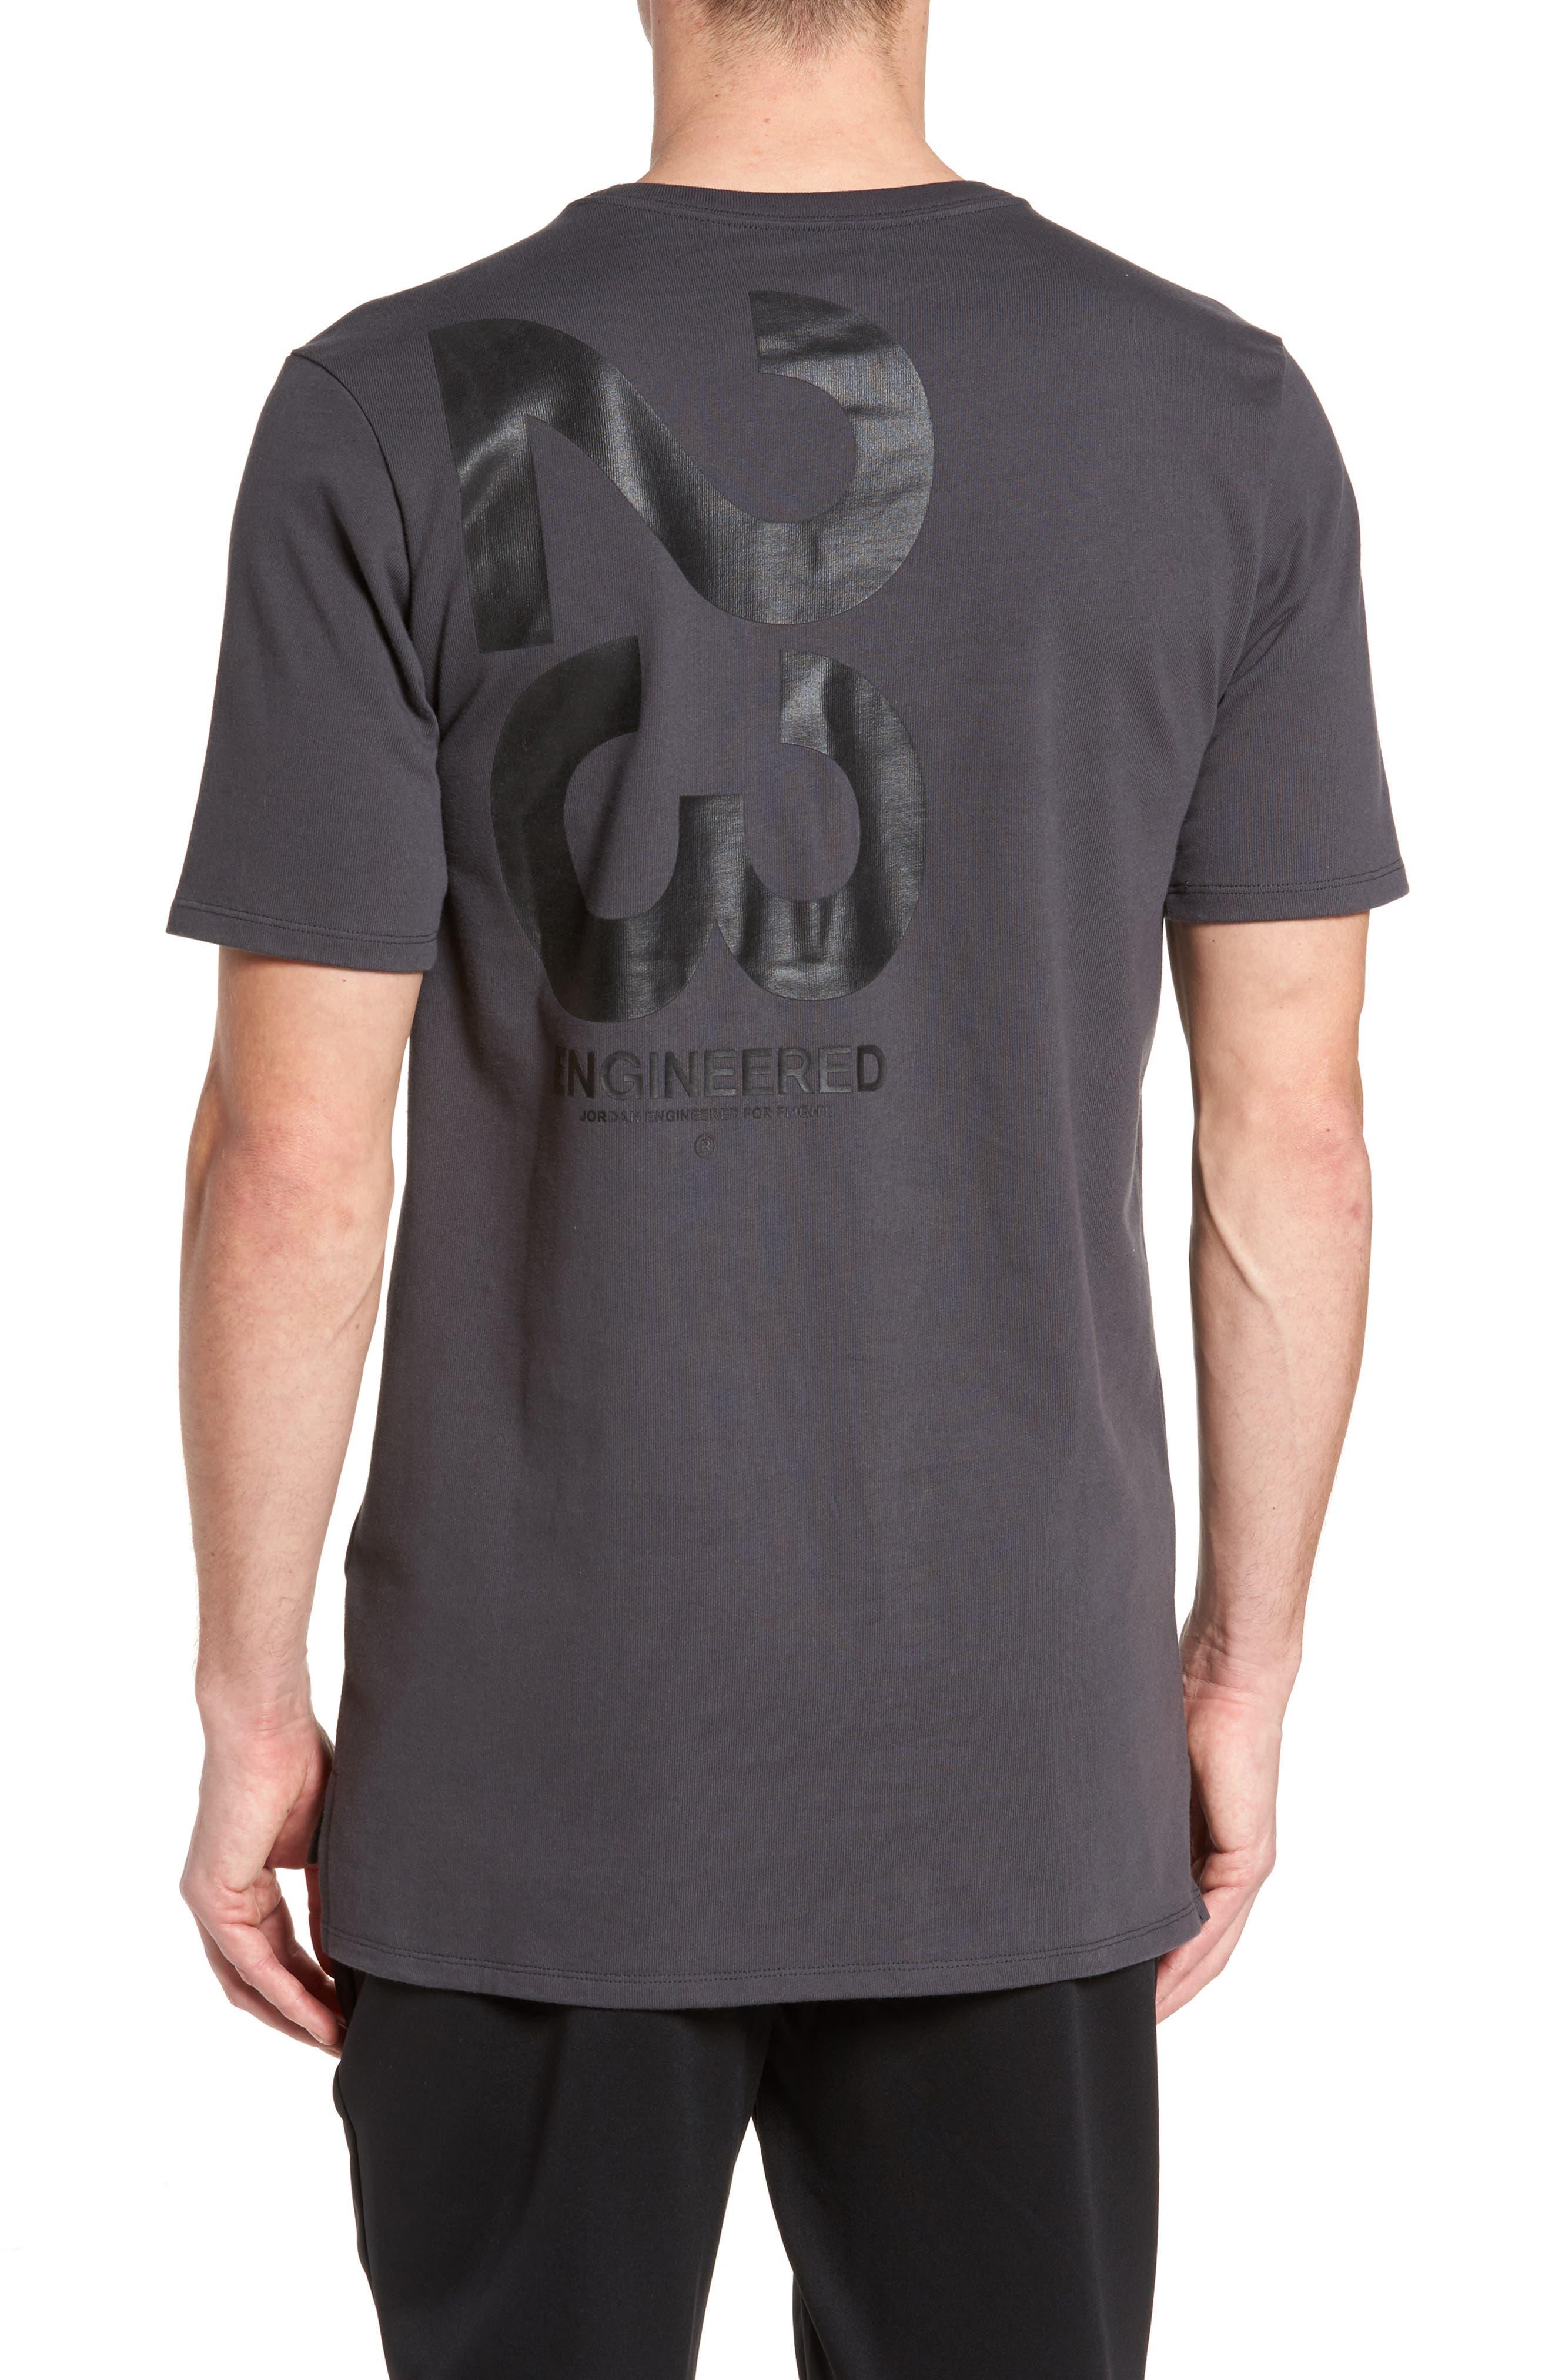 Sportswear 23 Engineered T-Shirt,                             Alternate thumbnail 2, color,                             Anthracite/ Black